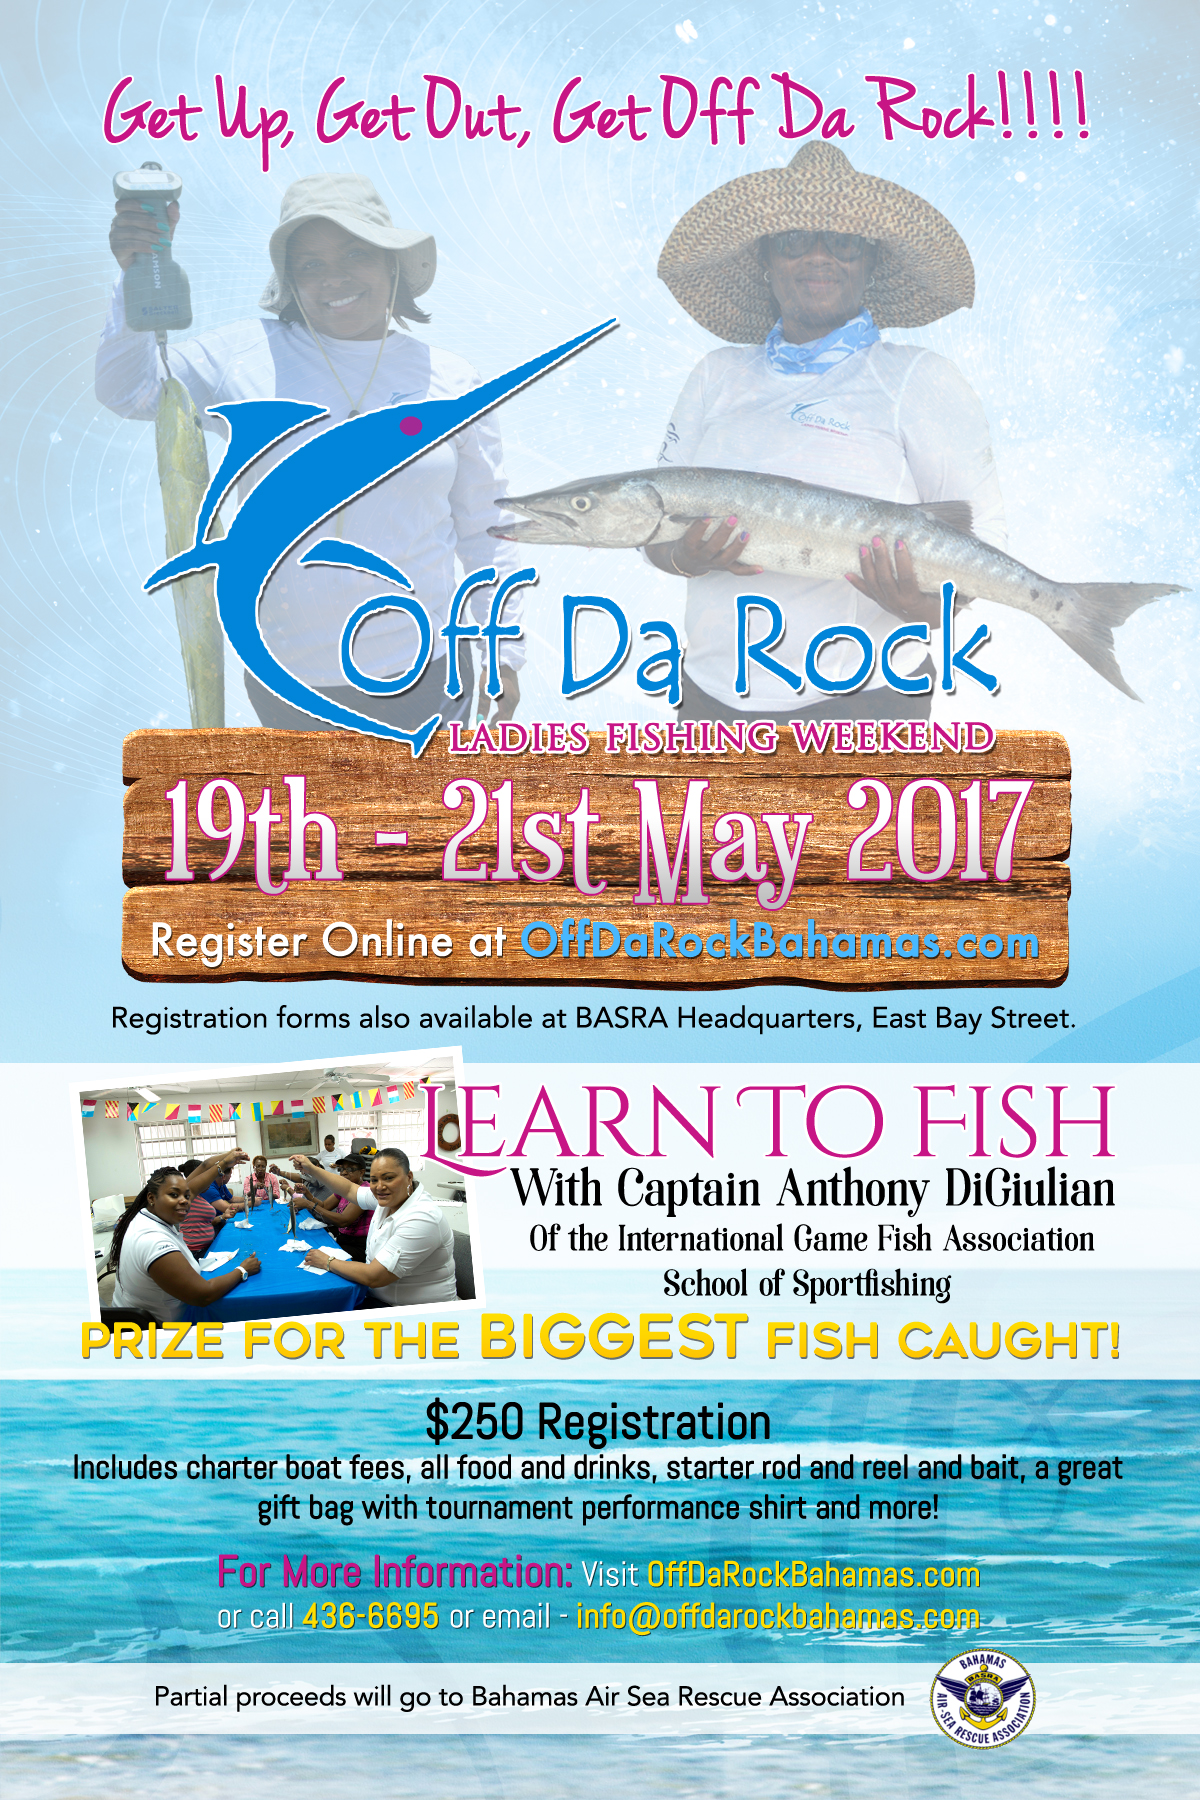 Off Da Rock Ladies Fishing Weekend